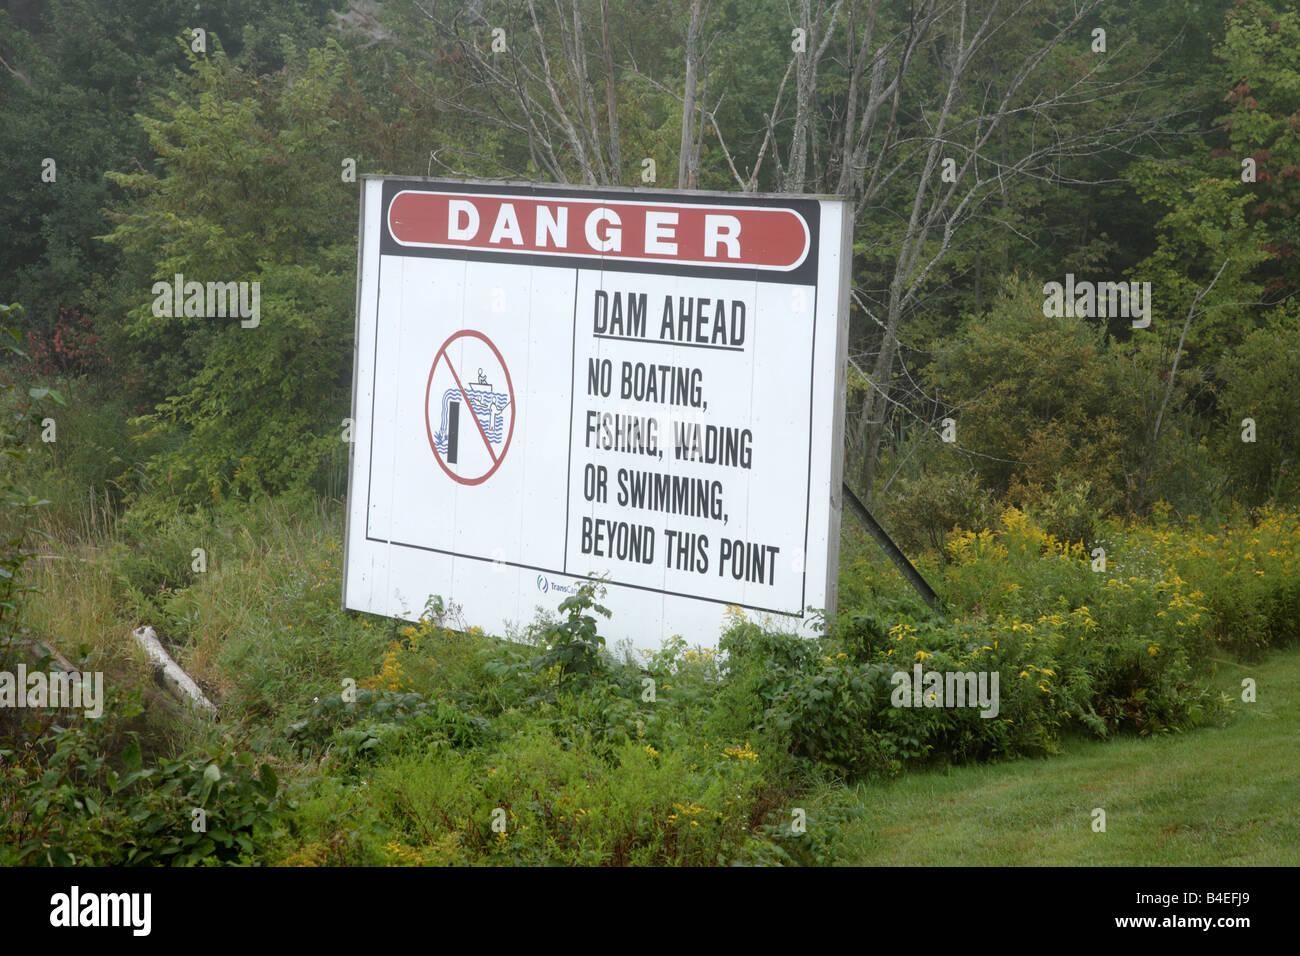 Ziemlich New England Draht Leominster Ma Ideen - Der Schaltplan ...